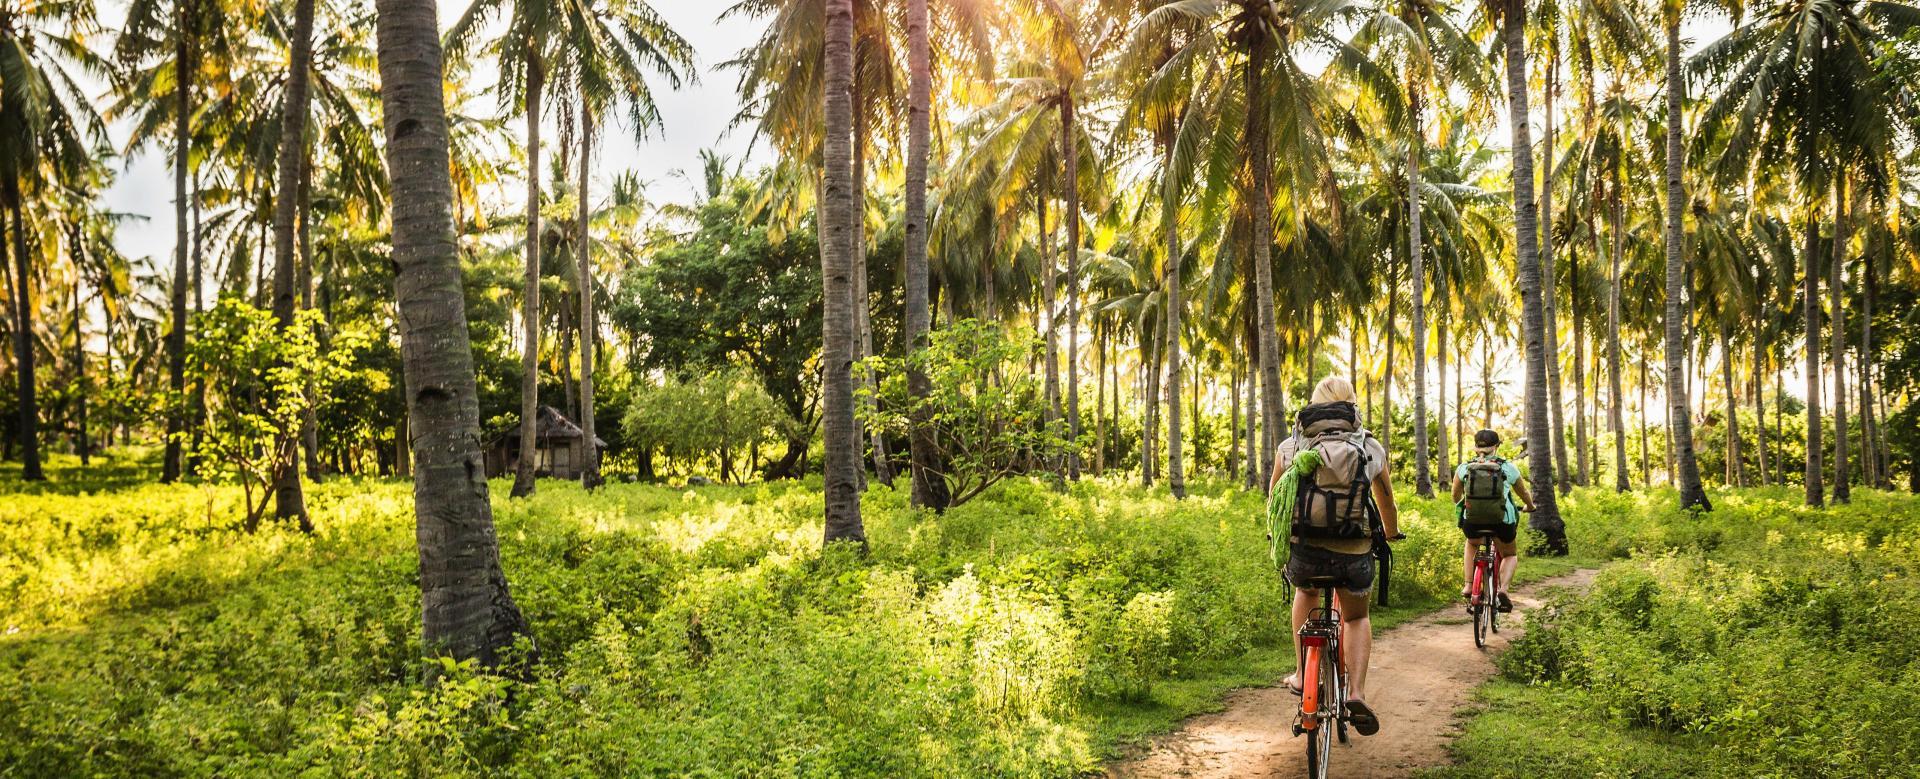 Voyage à vélo Indonésie : Vélo et rando à bali